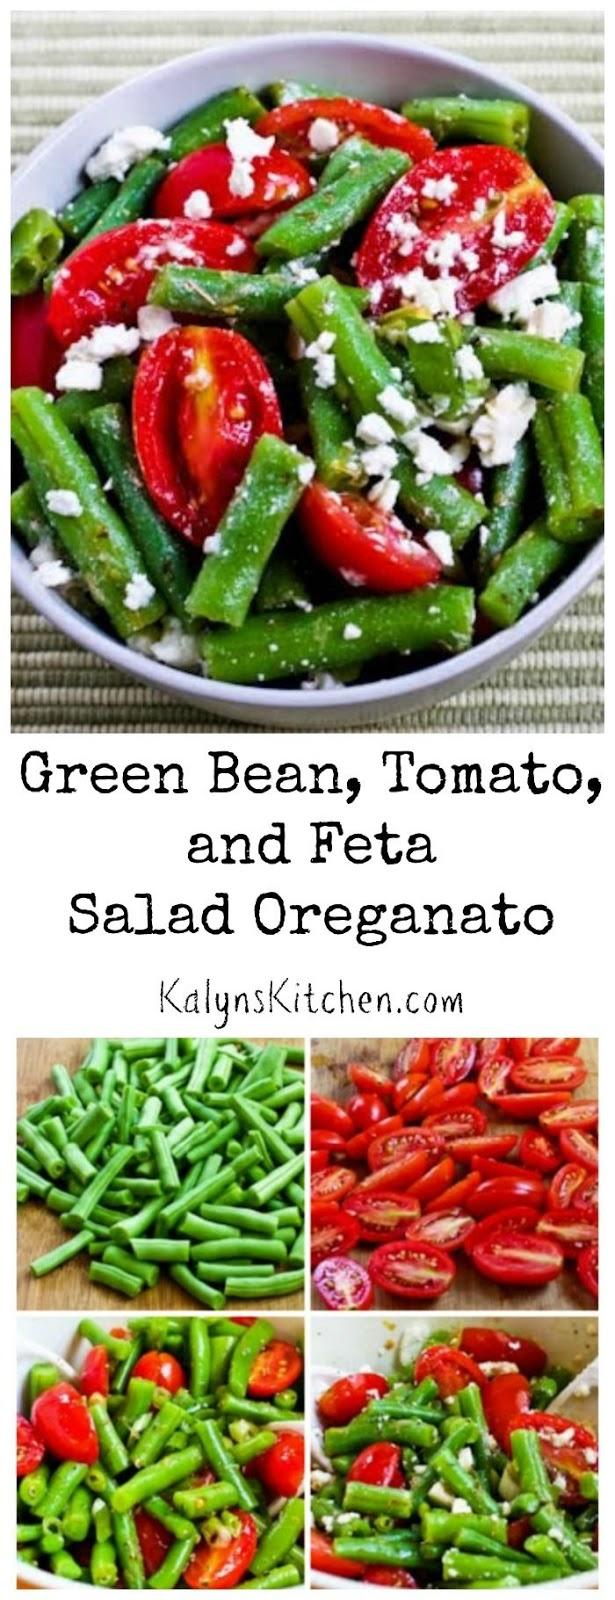 Green Bean, Tomato, and Feta Salad Oreganato [from KalynsKitchen.com]